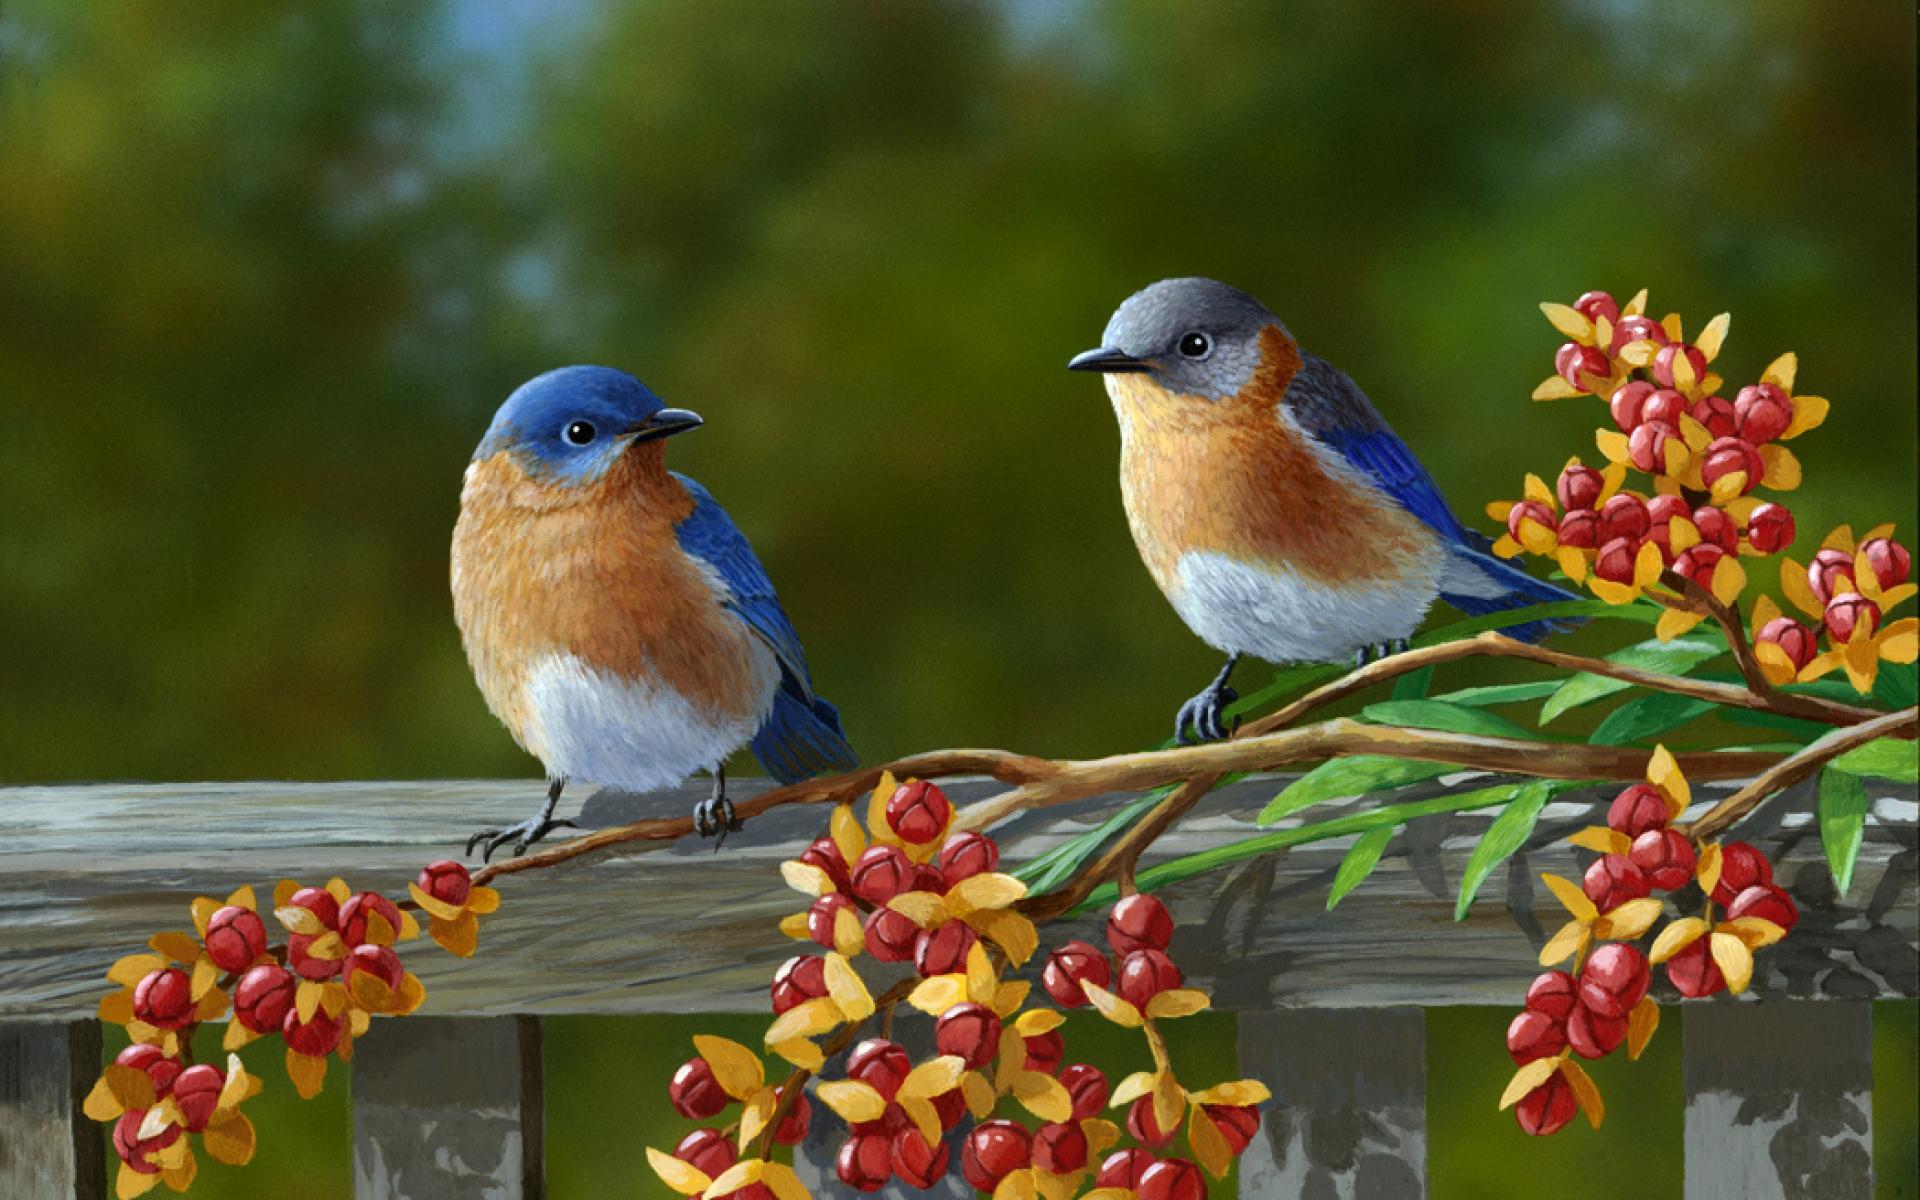 Full Hd Beautiful Birds 1915748 Hd Wallpaper Backgrounds